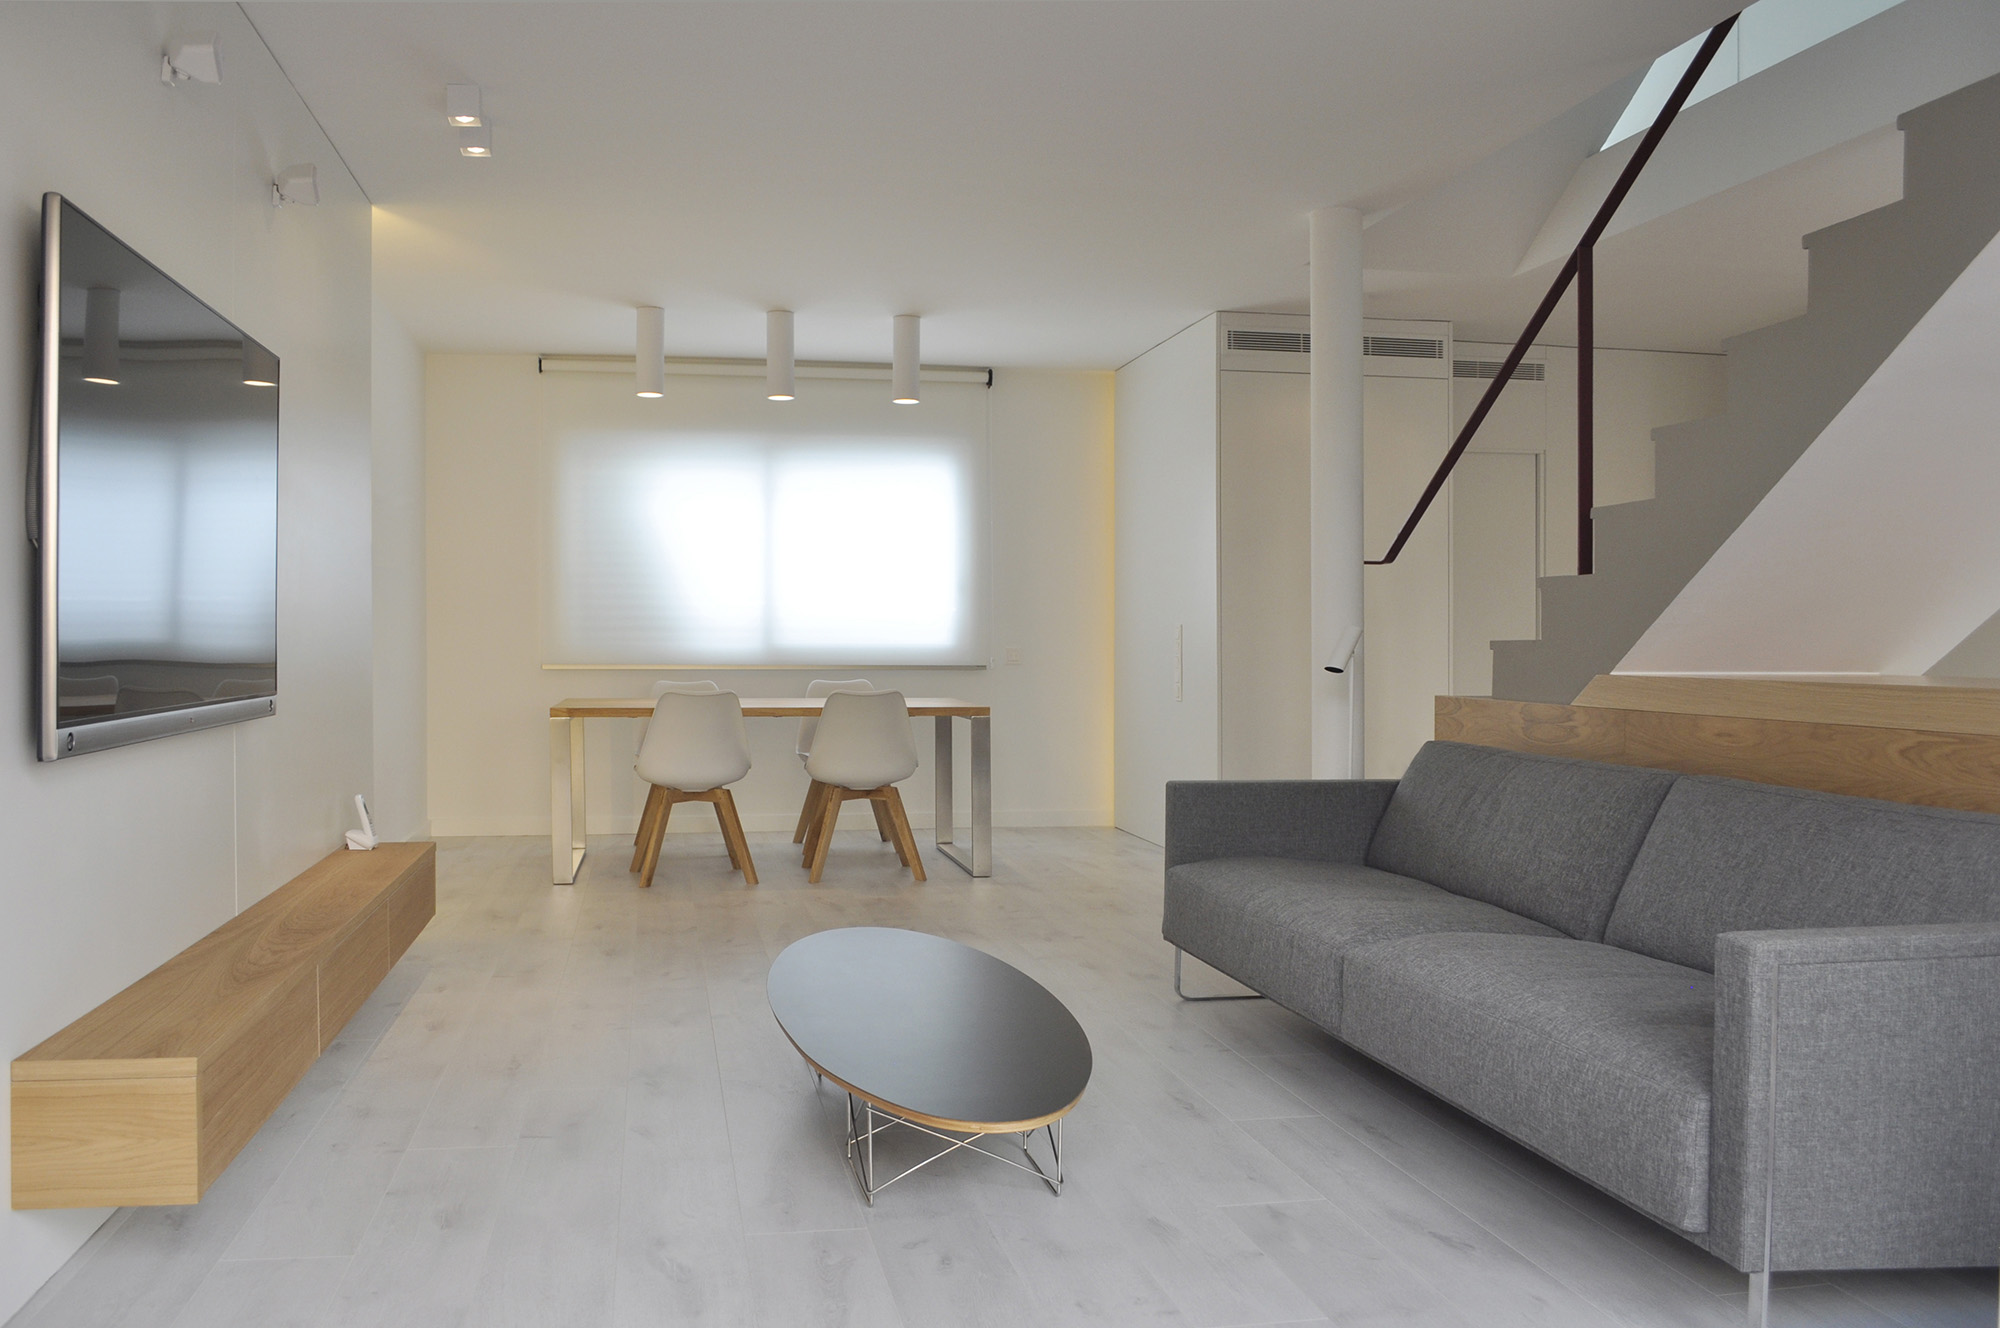 Interior minimalista para una joven pareja rardo architects for Casa minimalista barcelona capital